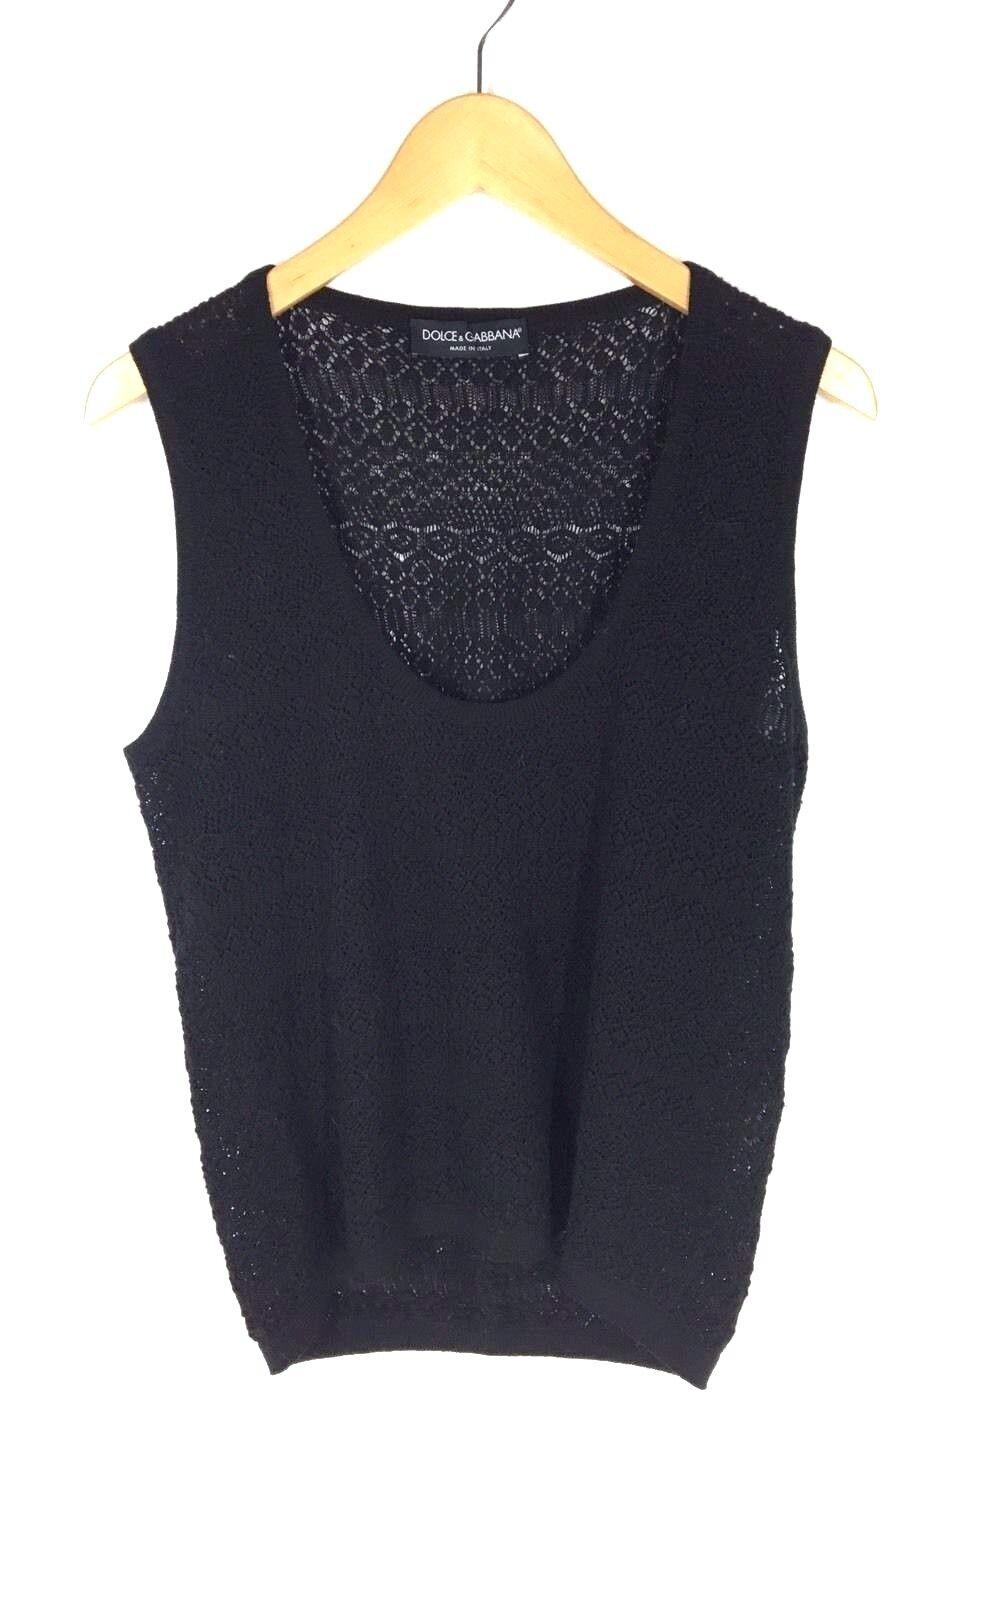 Dolce & Gabbana Size 44 Black Knit Wool Top - image 1